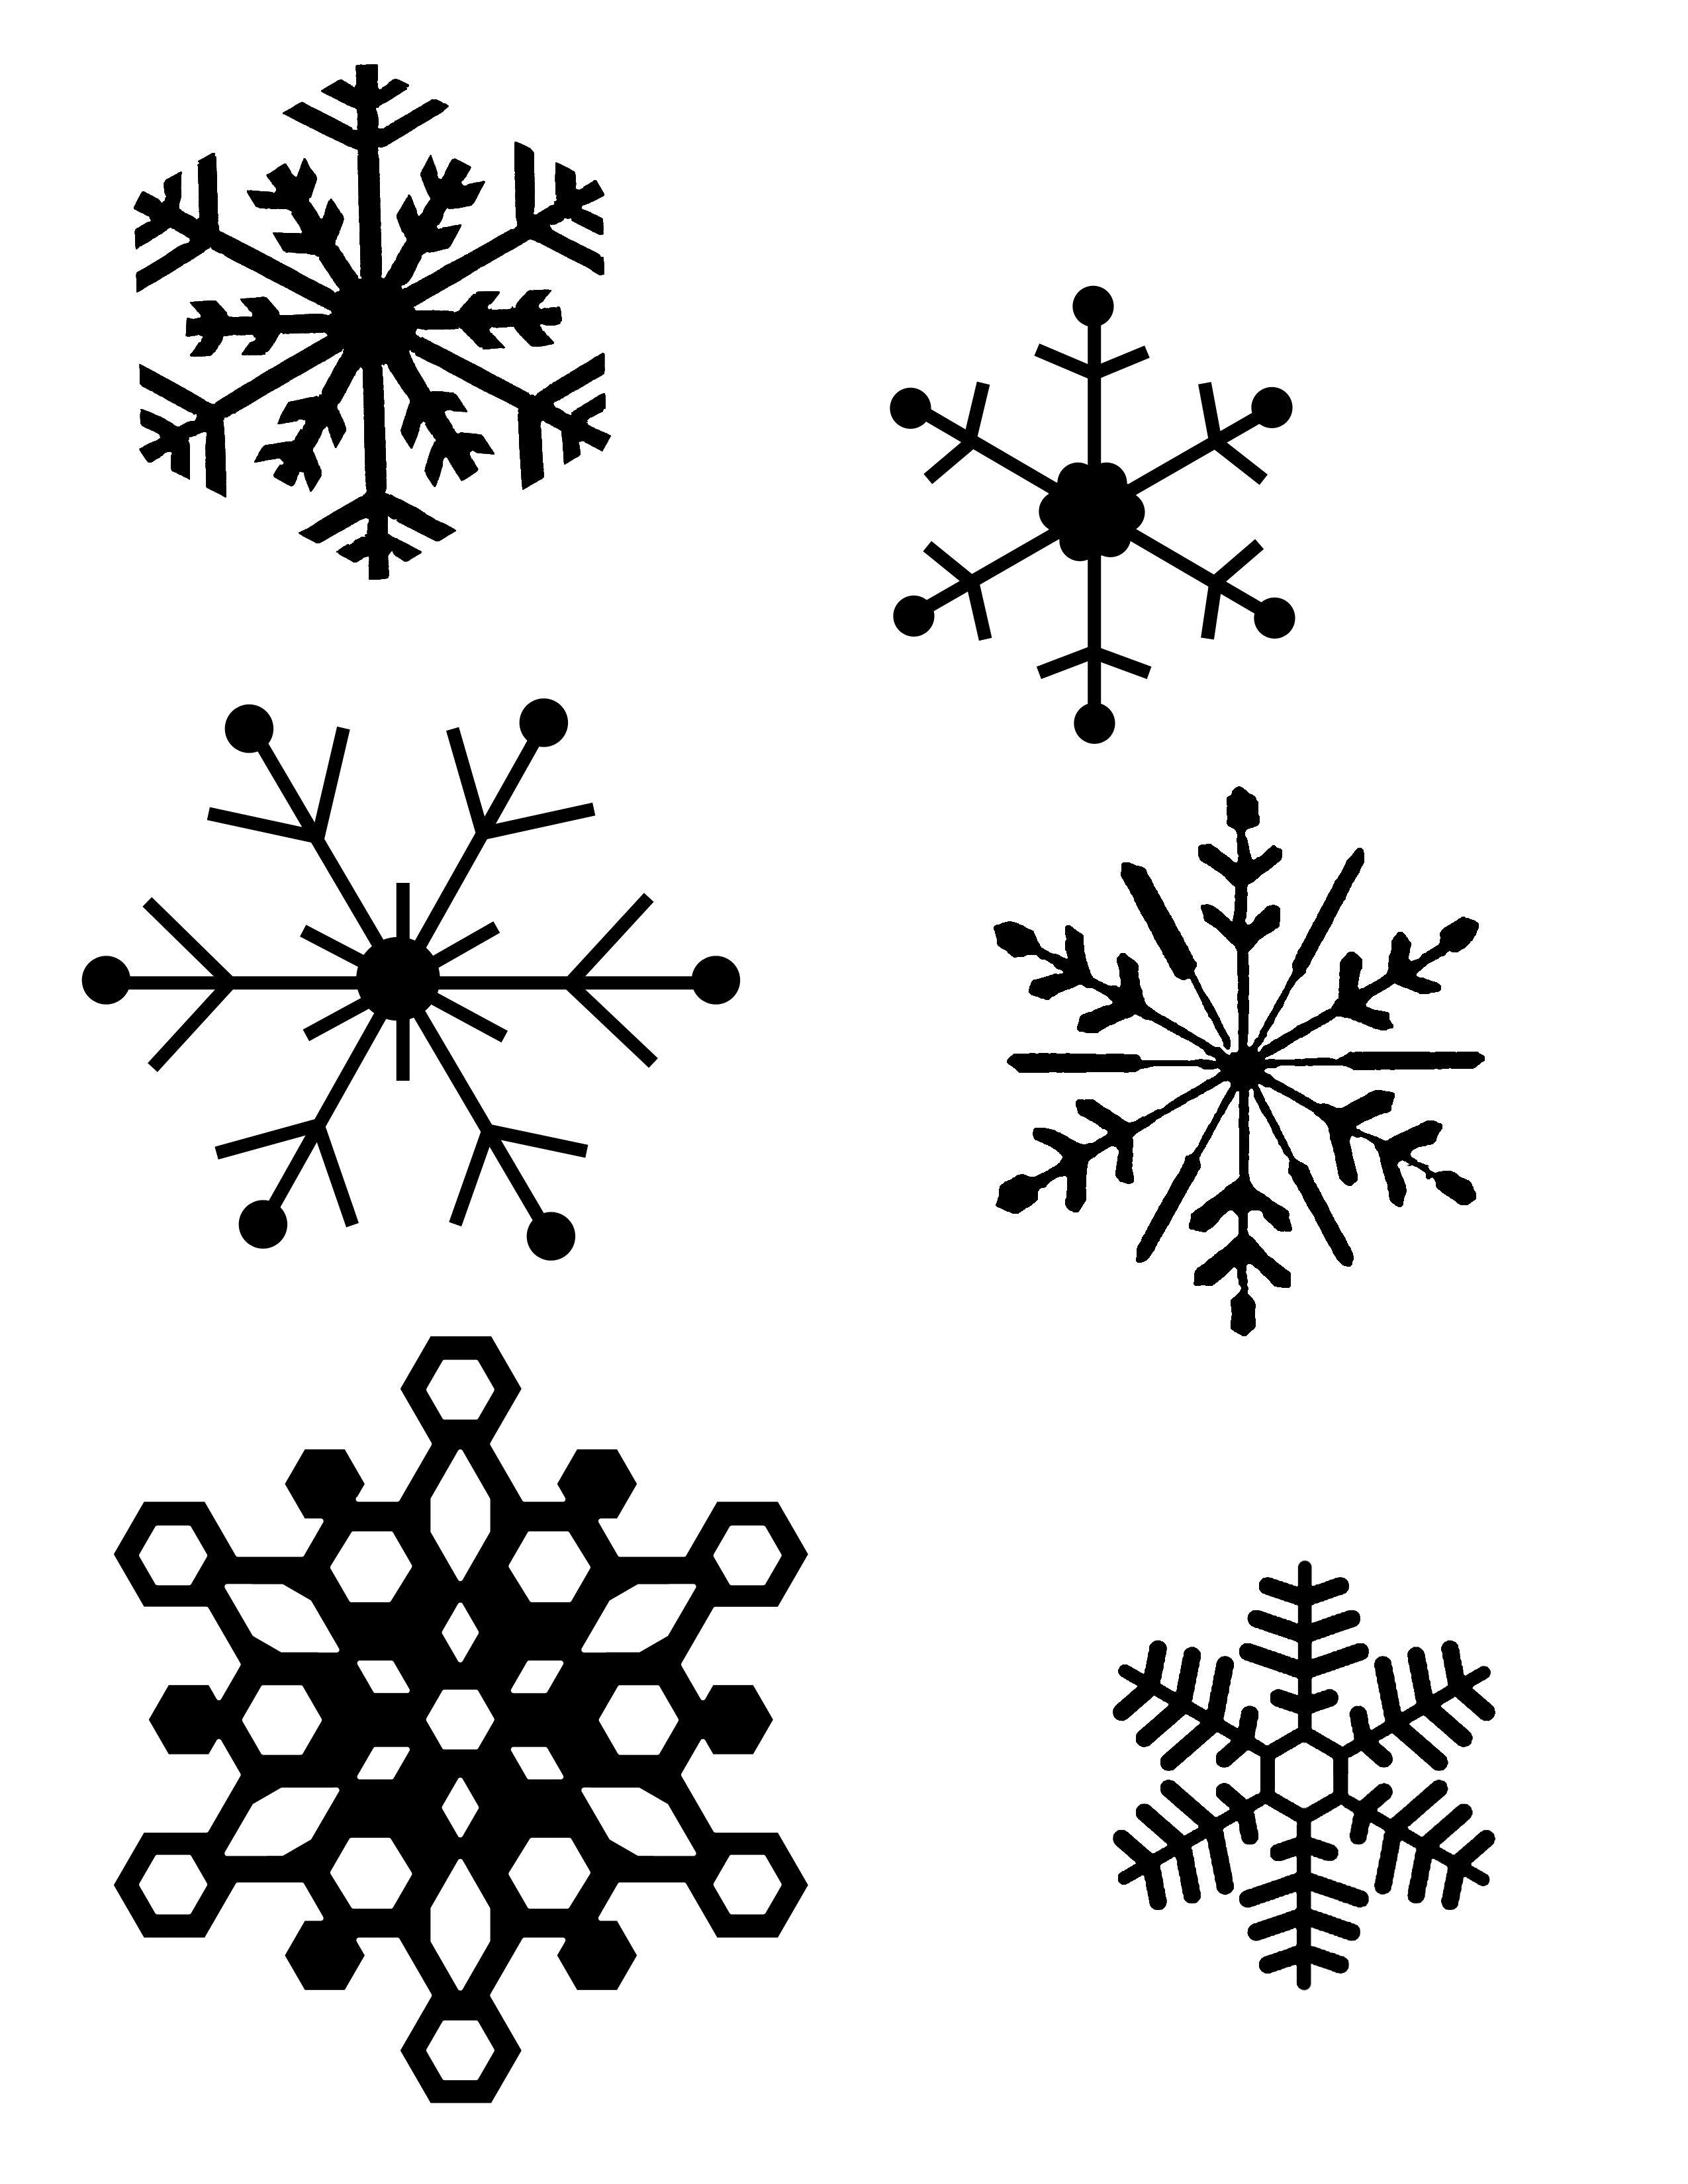 Snowflake Patterns (For Hot Glue Gun Snowflakes) I Think I Will Be - Snowflake Template Free Printable